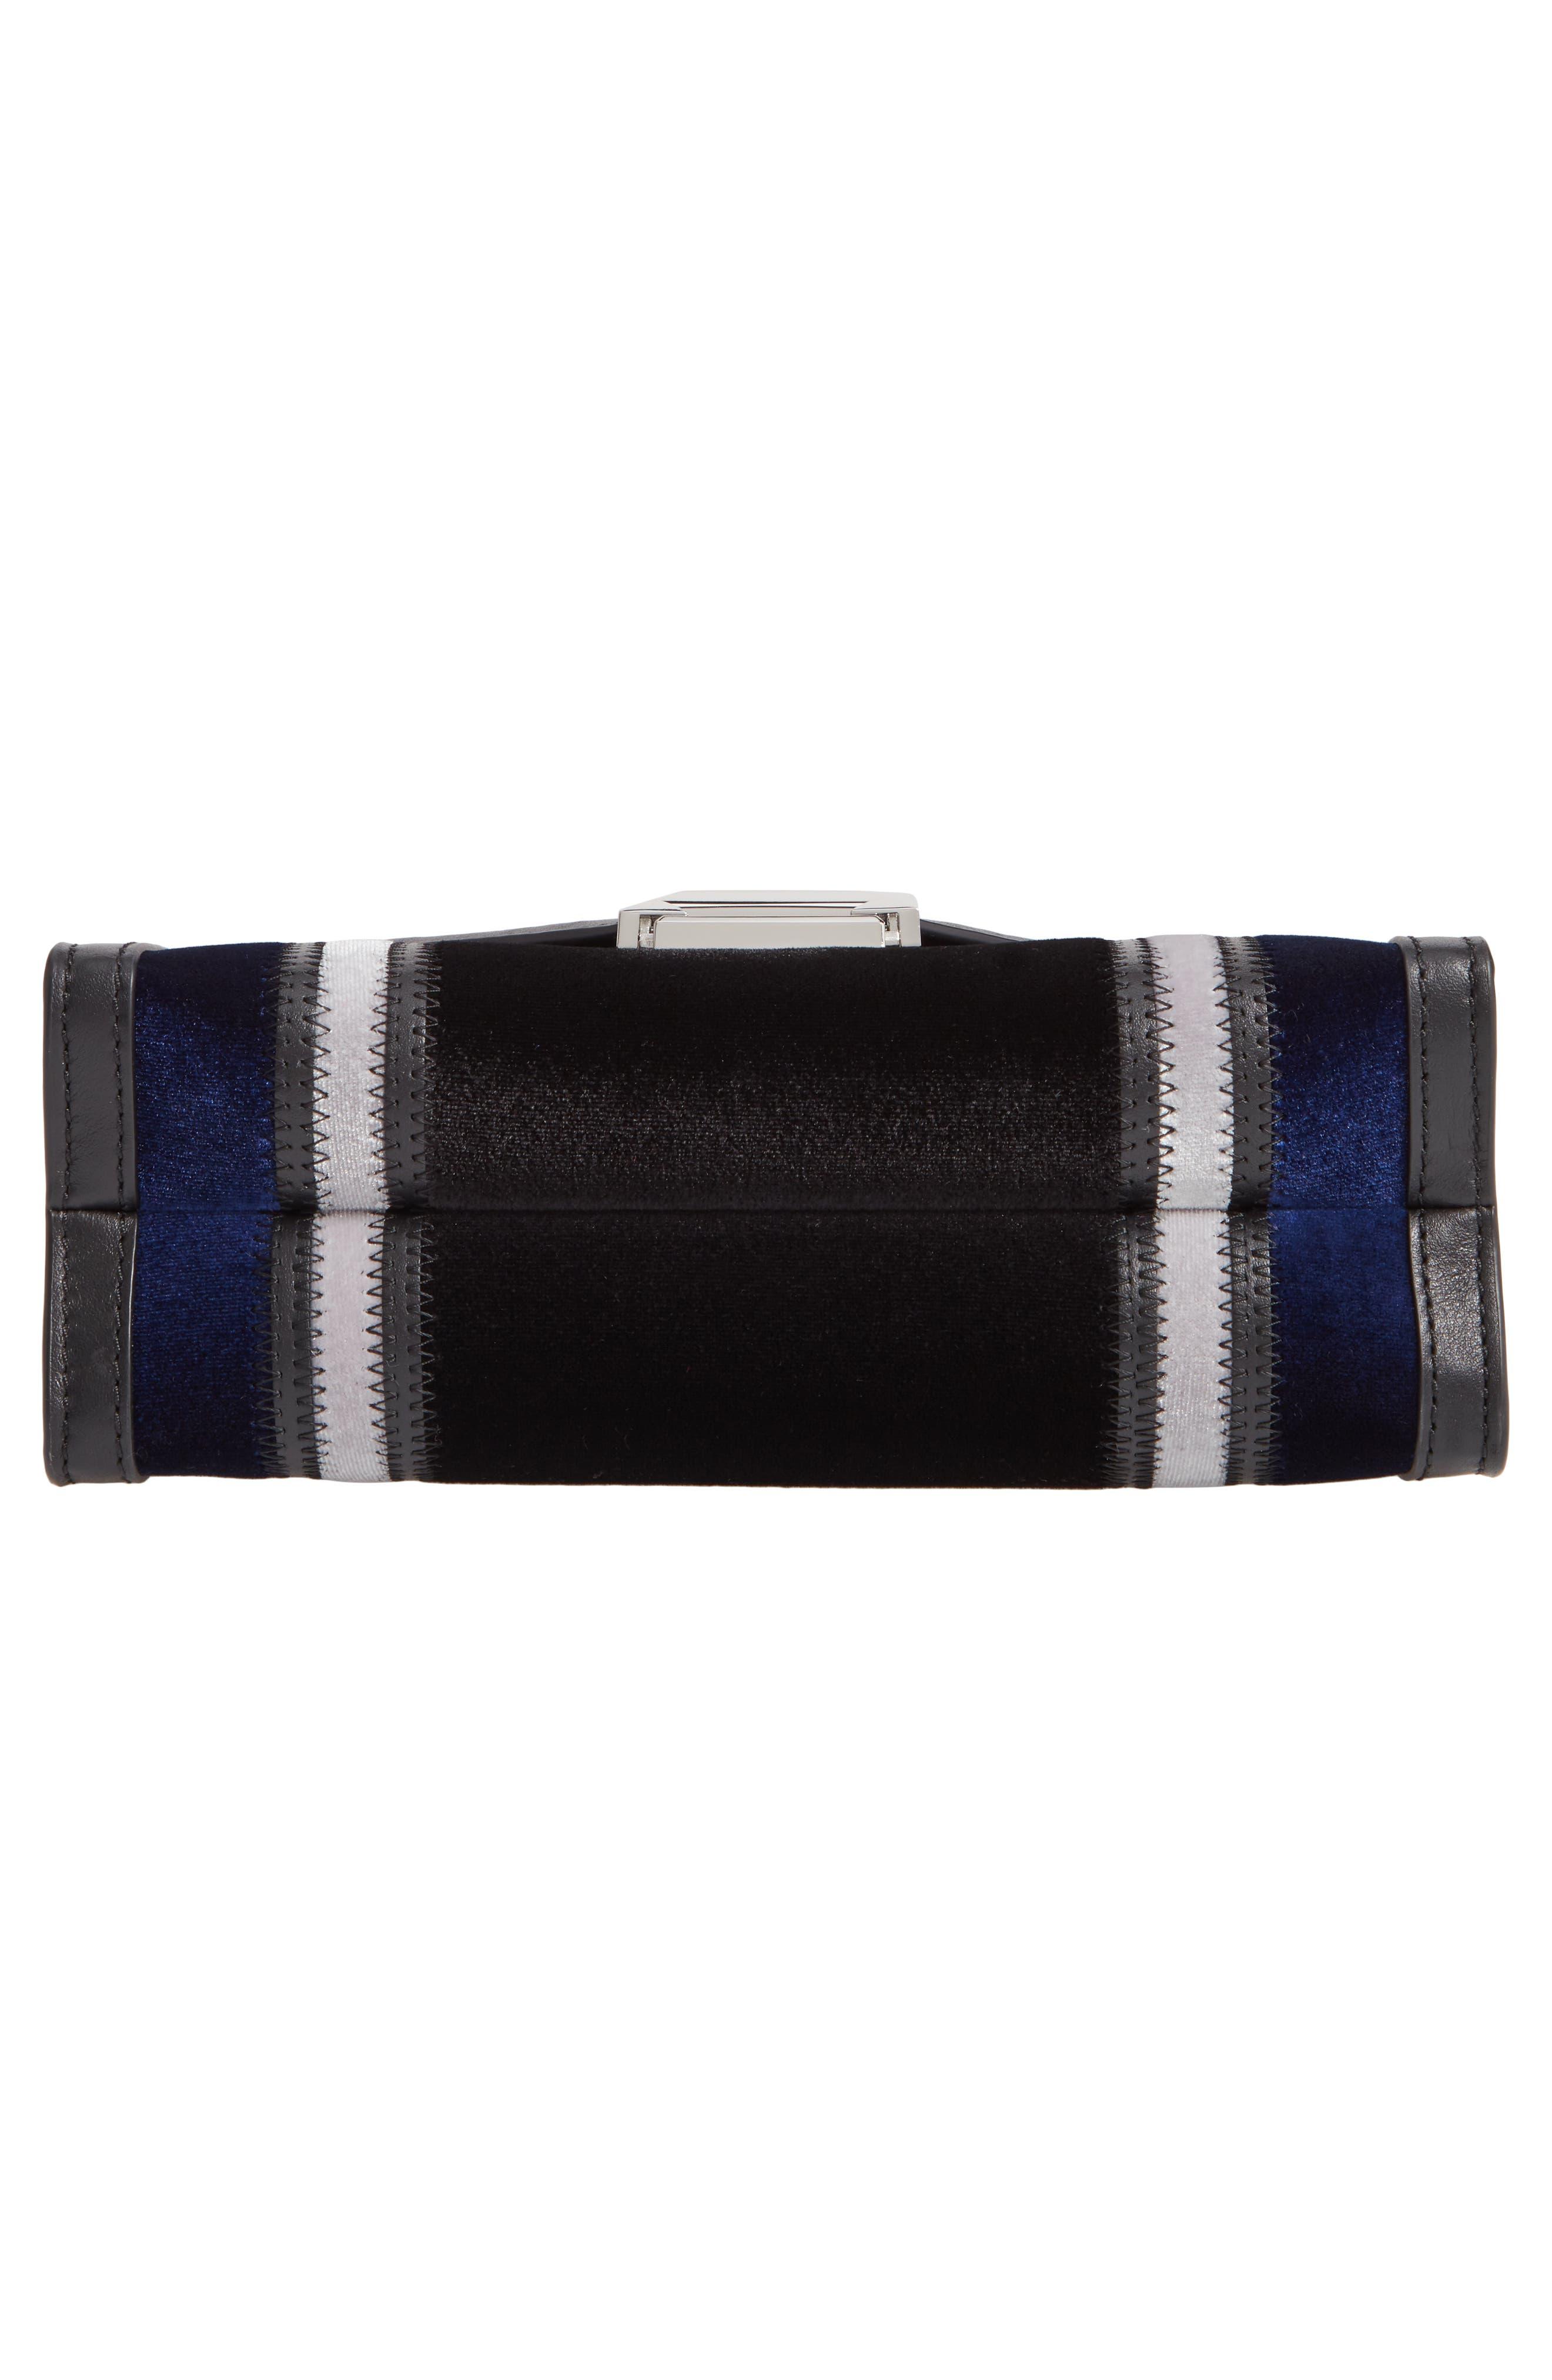 Large Velvet Shoulder Bag,                             Alternate thumbnail 6, color,                             BLACK/ DARK BLUE